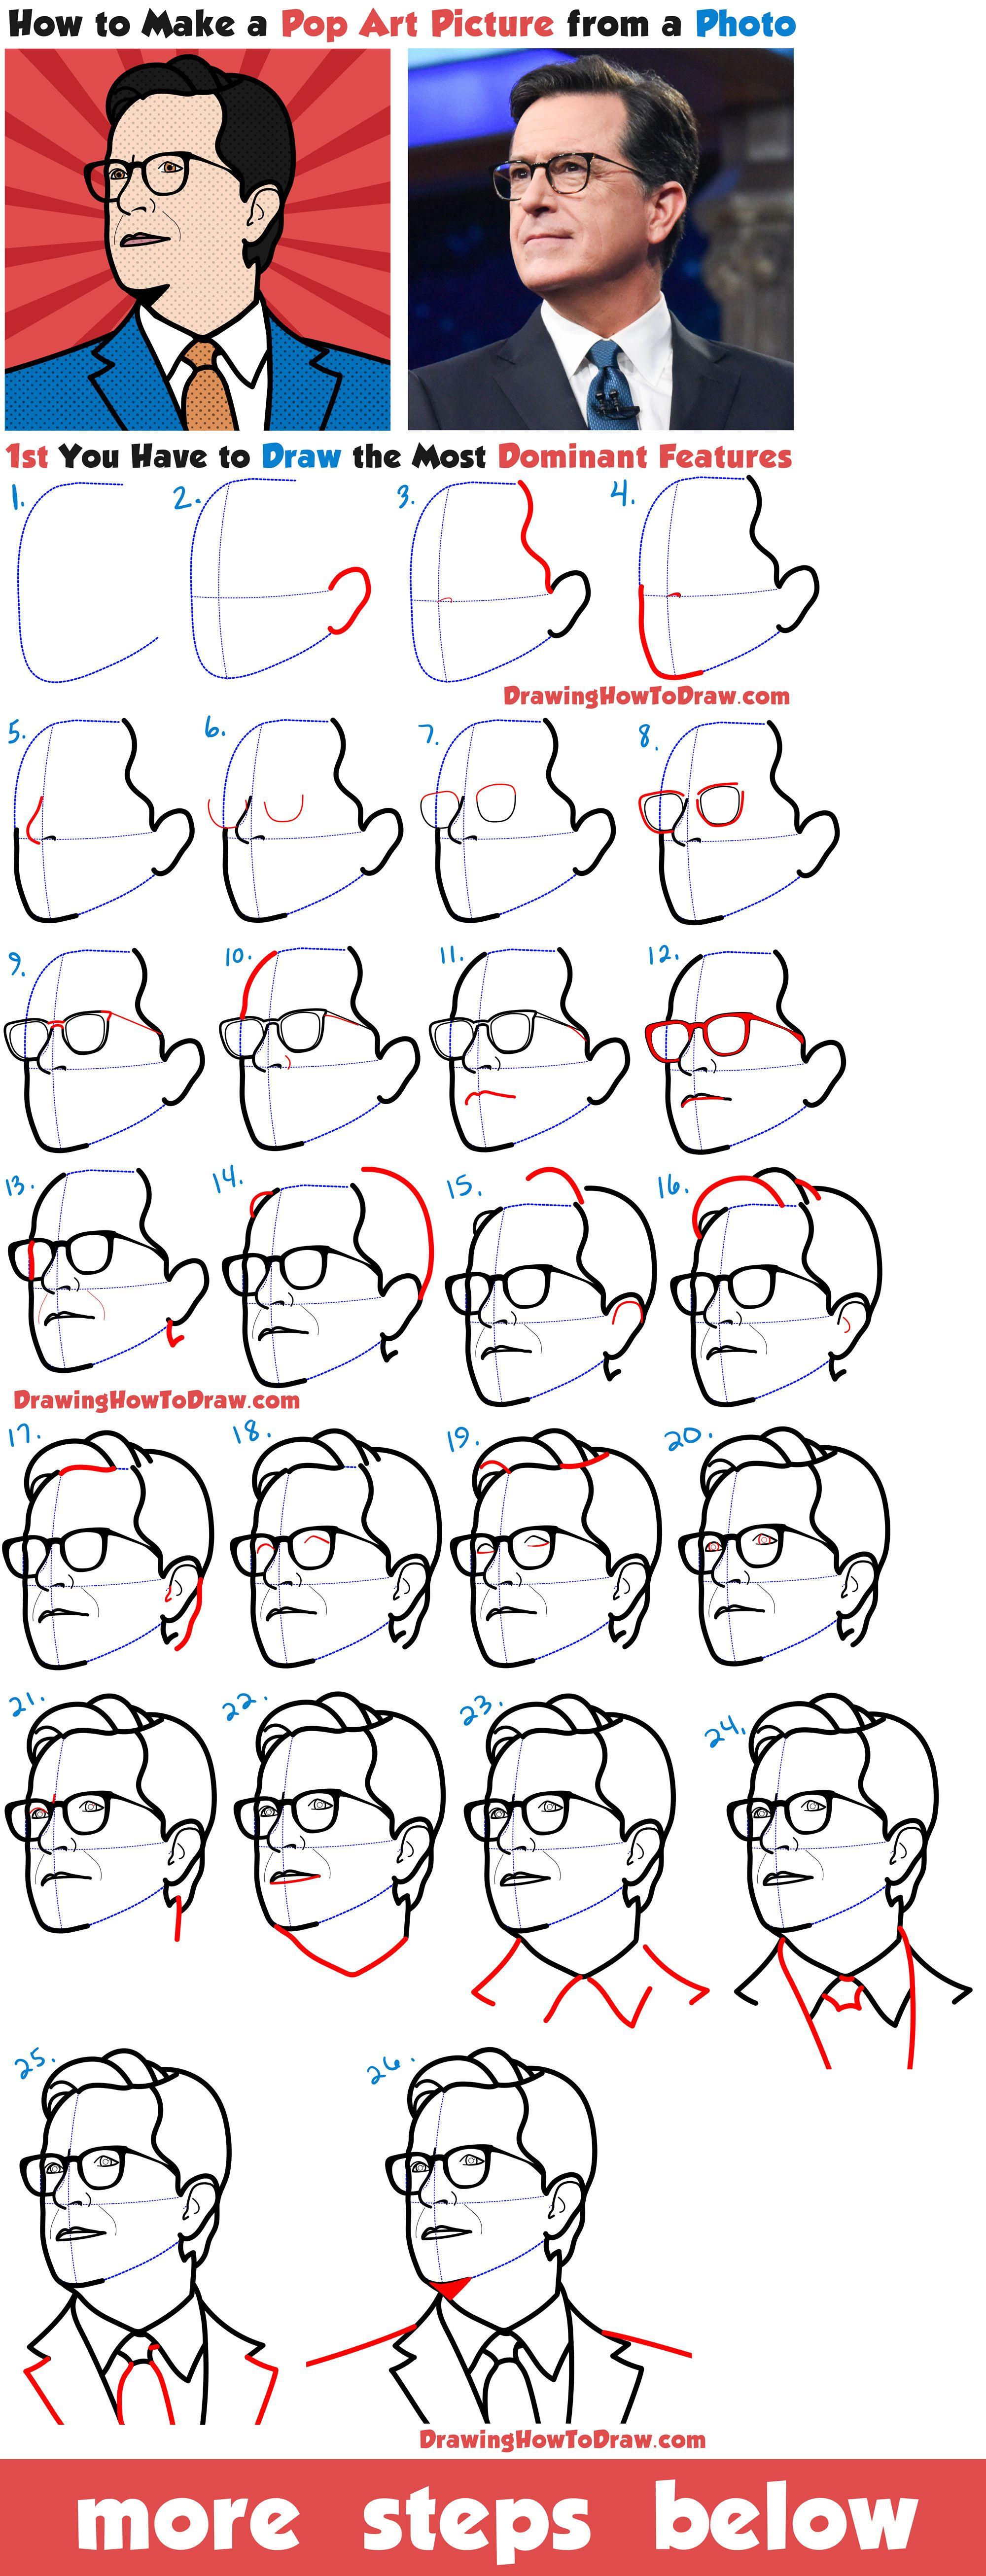 images?q=tbn:ANd9GcQh_l3eQ5xwiPy07kGEXjmjgmBKBRB7H2mRxCGhv1tFWg5c_mWT Get Inspired For Easy Beginner Pop Art Drawing @koolgadgetz.com.info